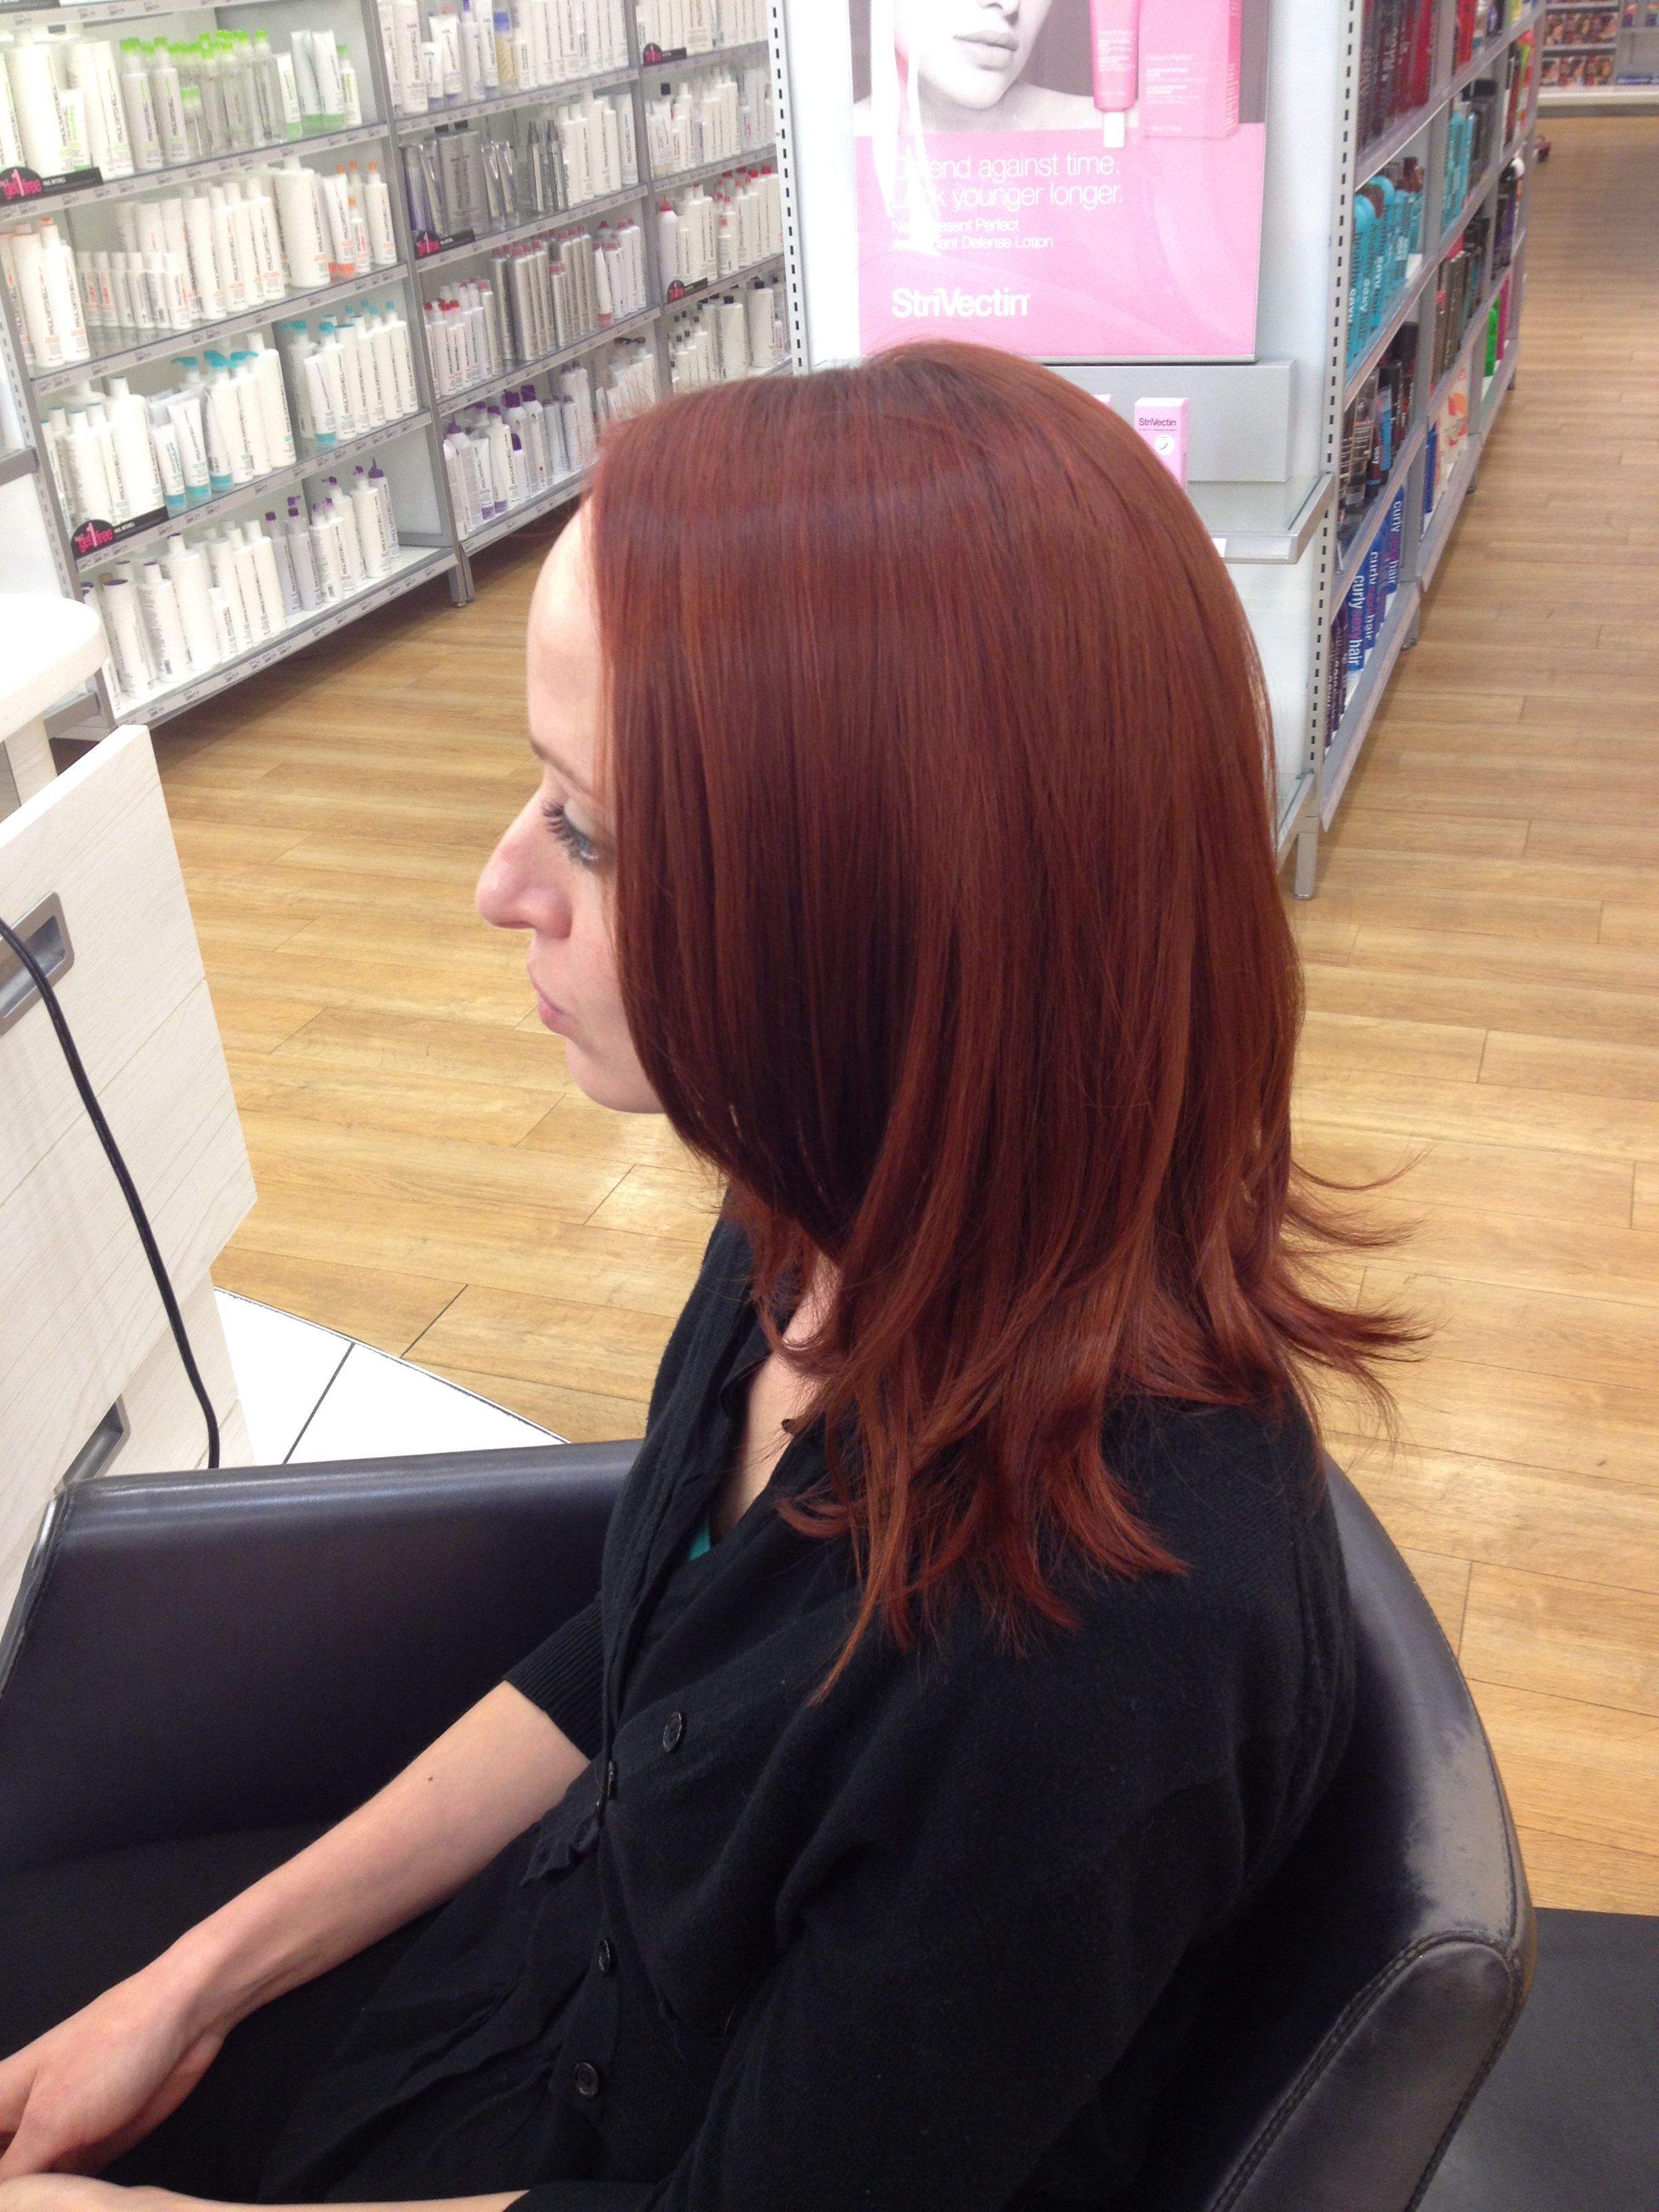 Hair By Marisa 5c Redken Shades Eq